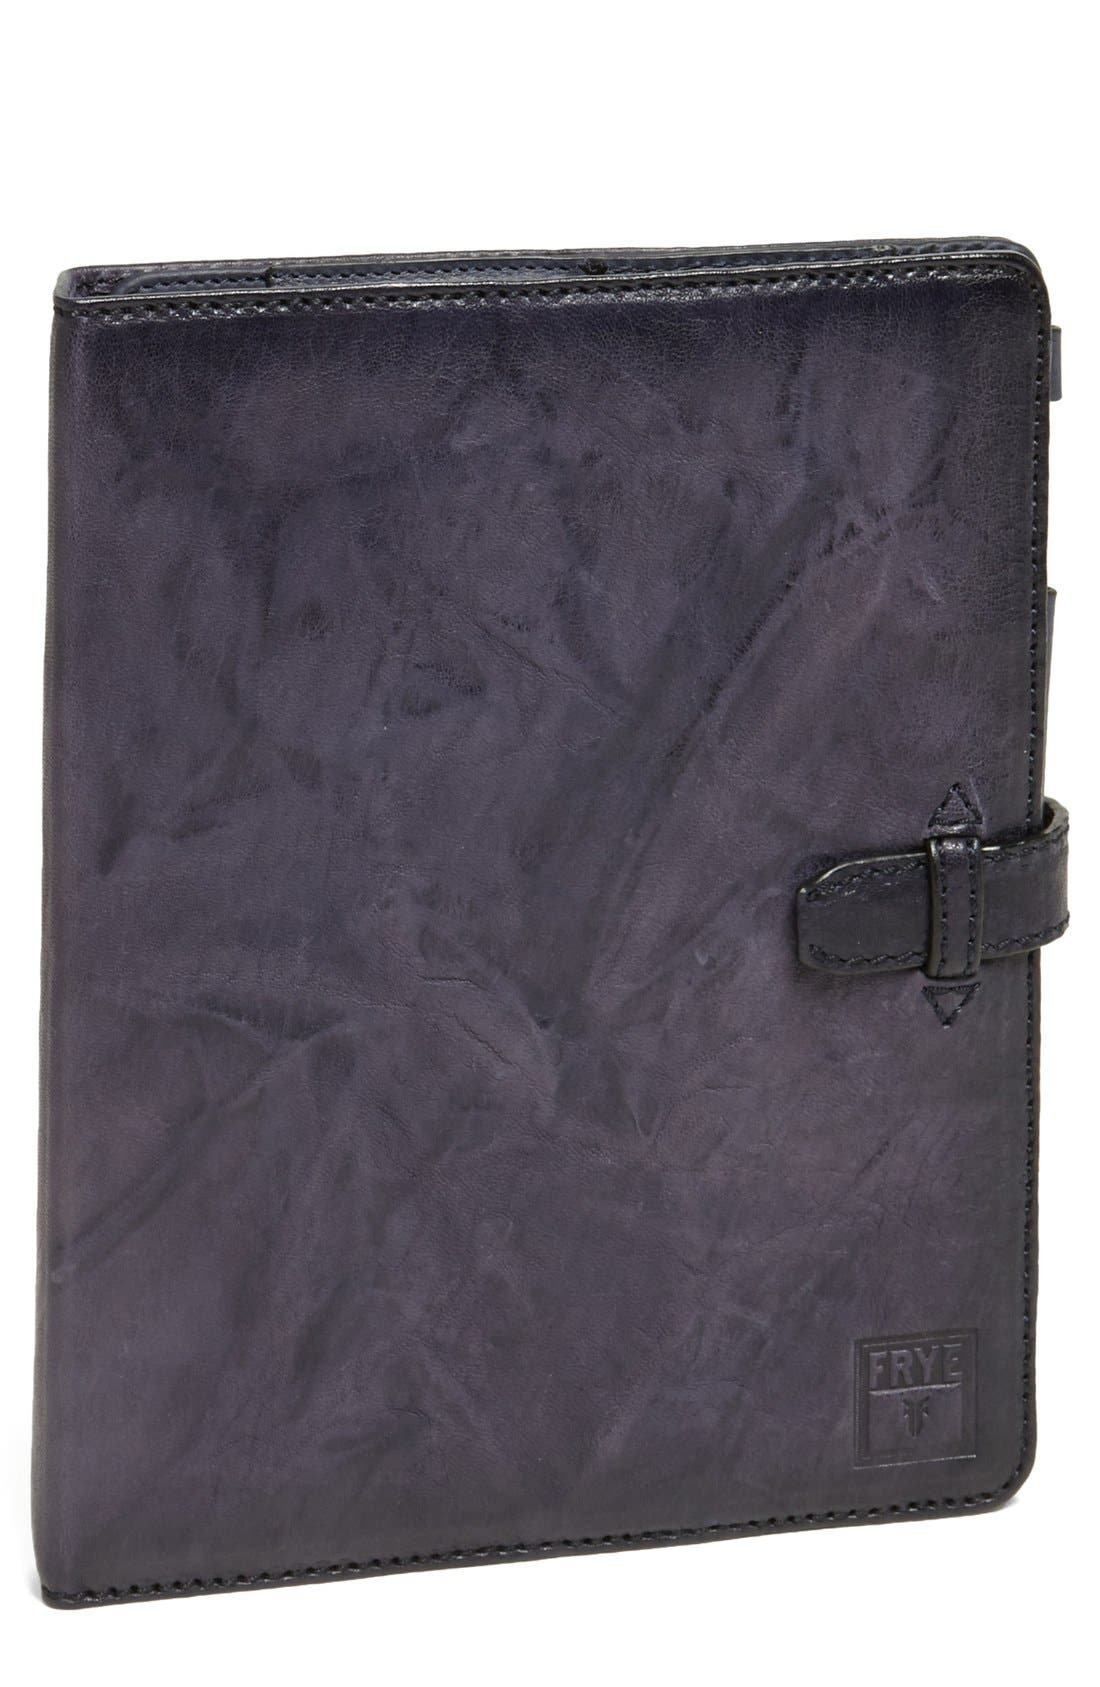 Main Image - Frye 'Cameron' iPad 2 & 3 Case